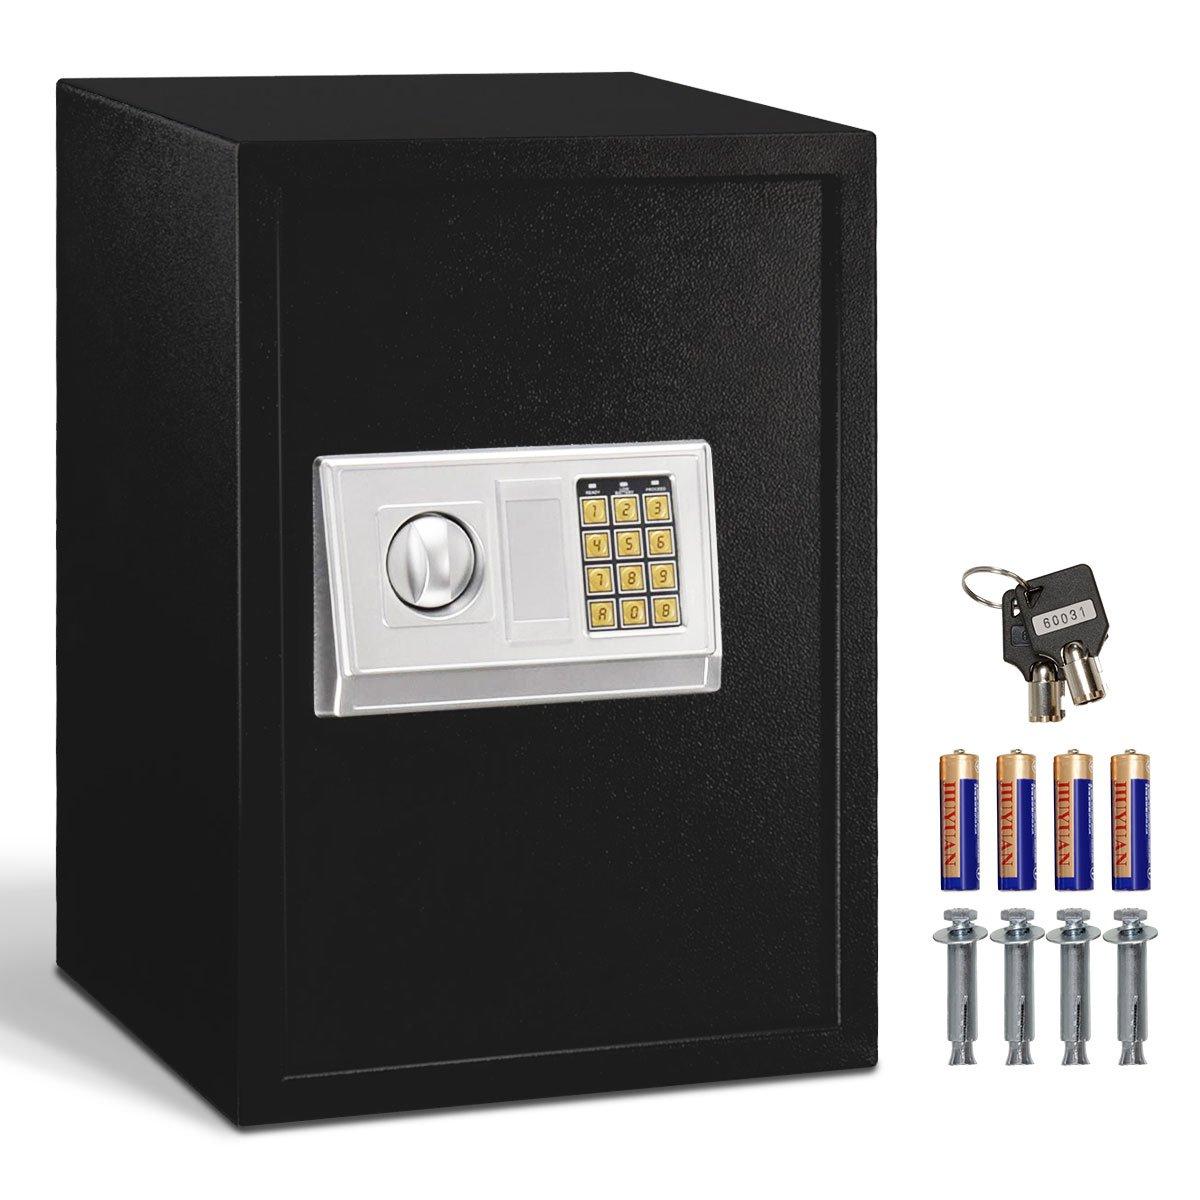 Giantex Largeデジタル電子セーフボックスキーパッドロックセキュリティホームオフィスホテルガン B01IH8SQT8